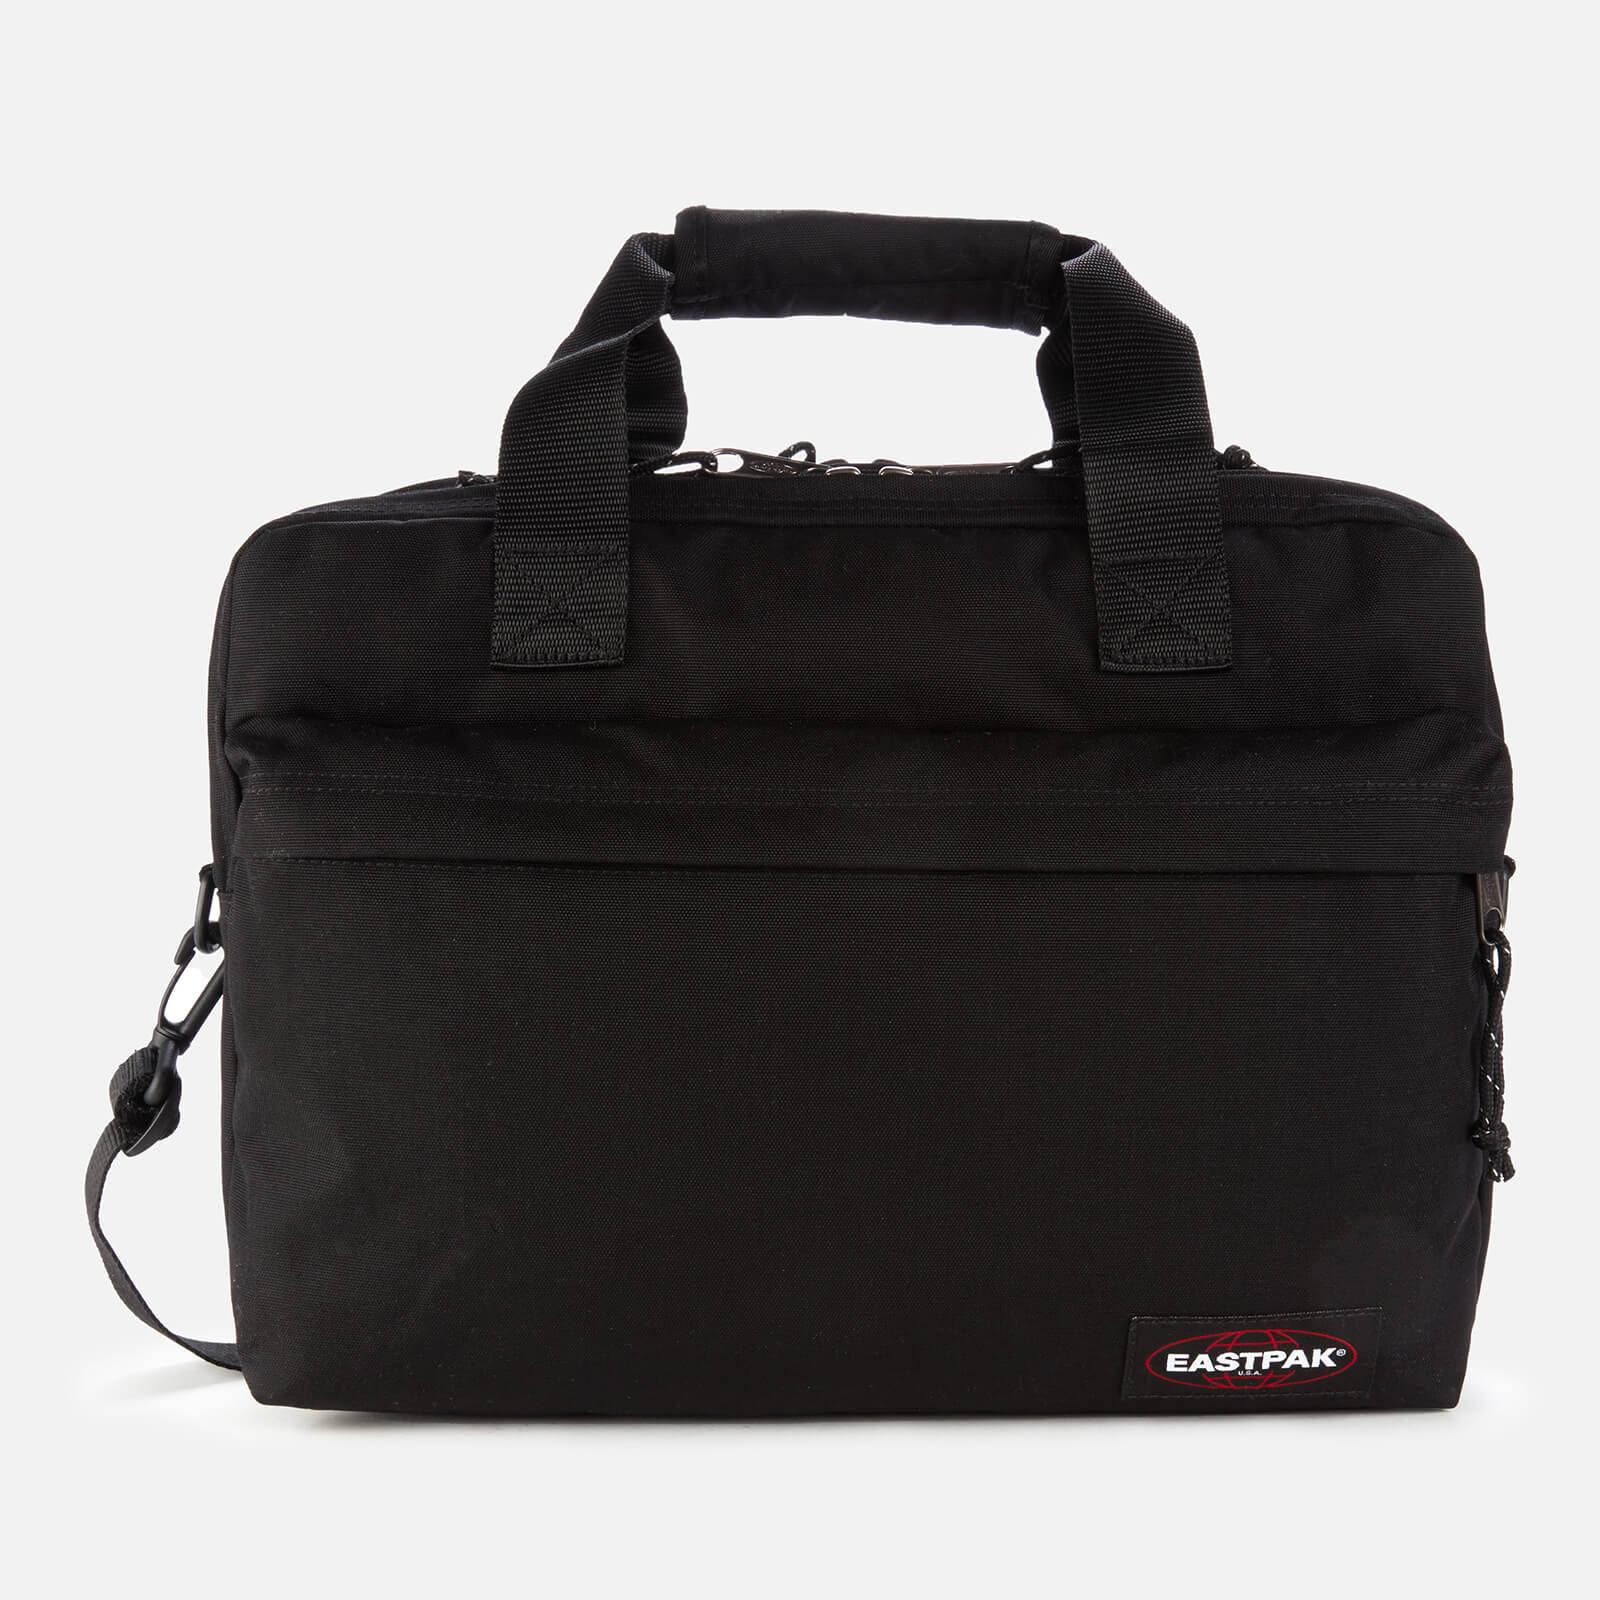 Eastpak Men's Bartech Laptop Bag - Black